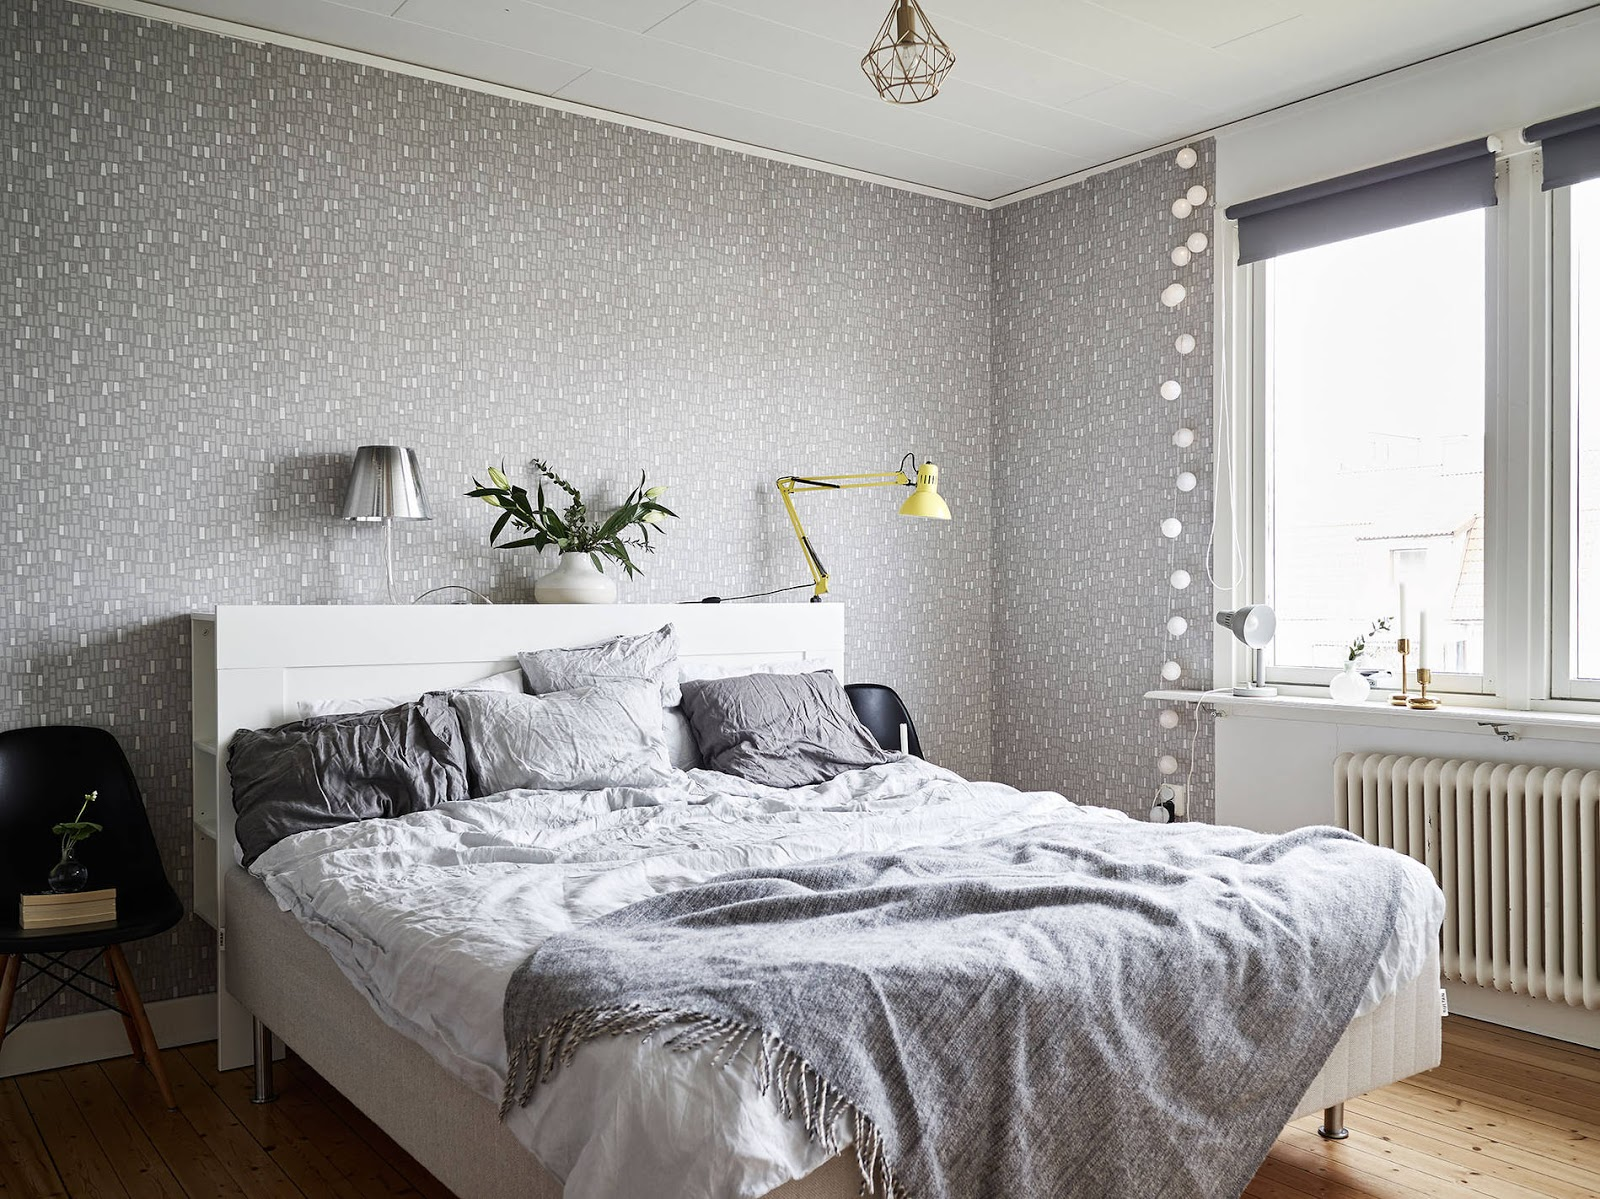 Tapety sypialnia